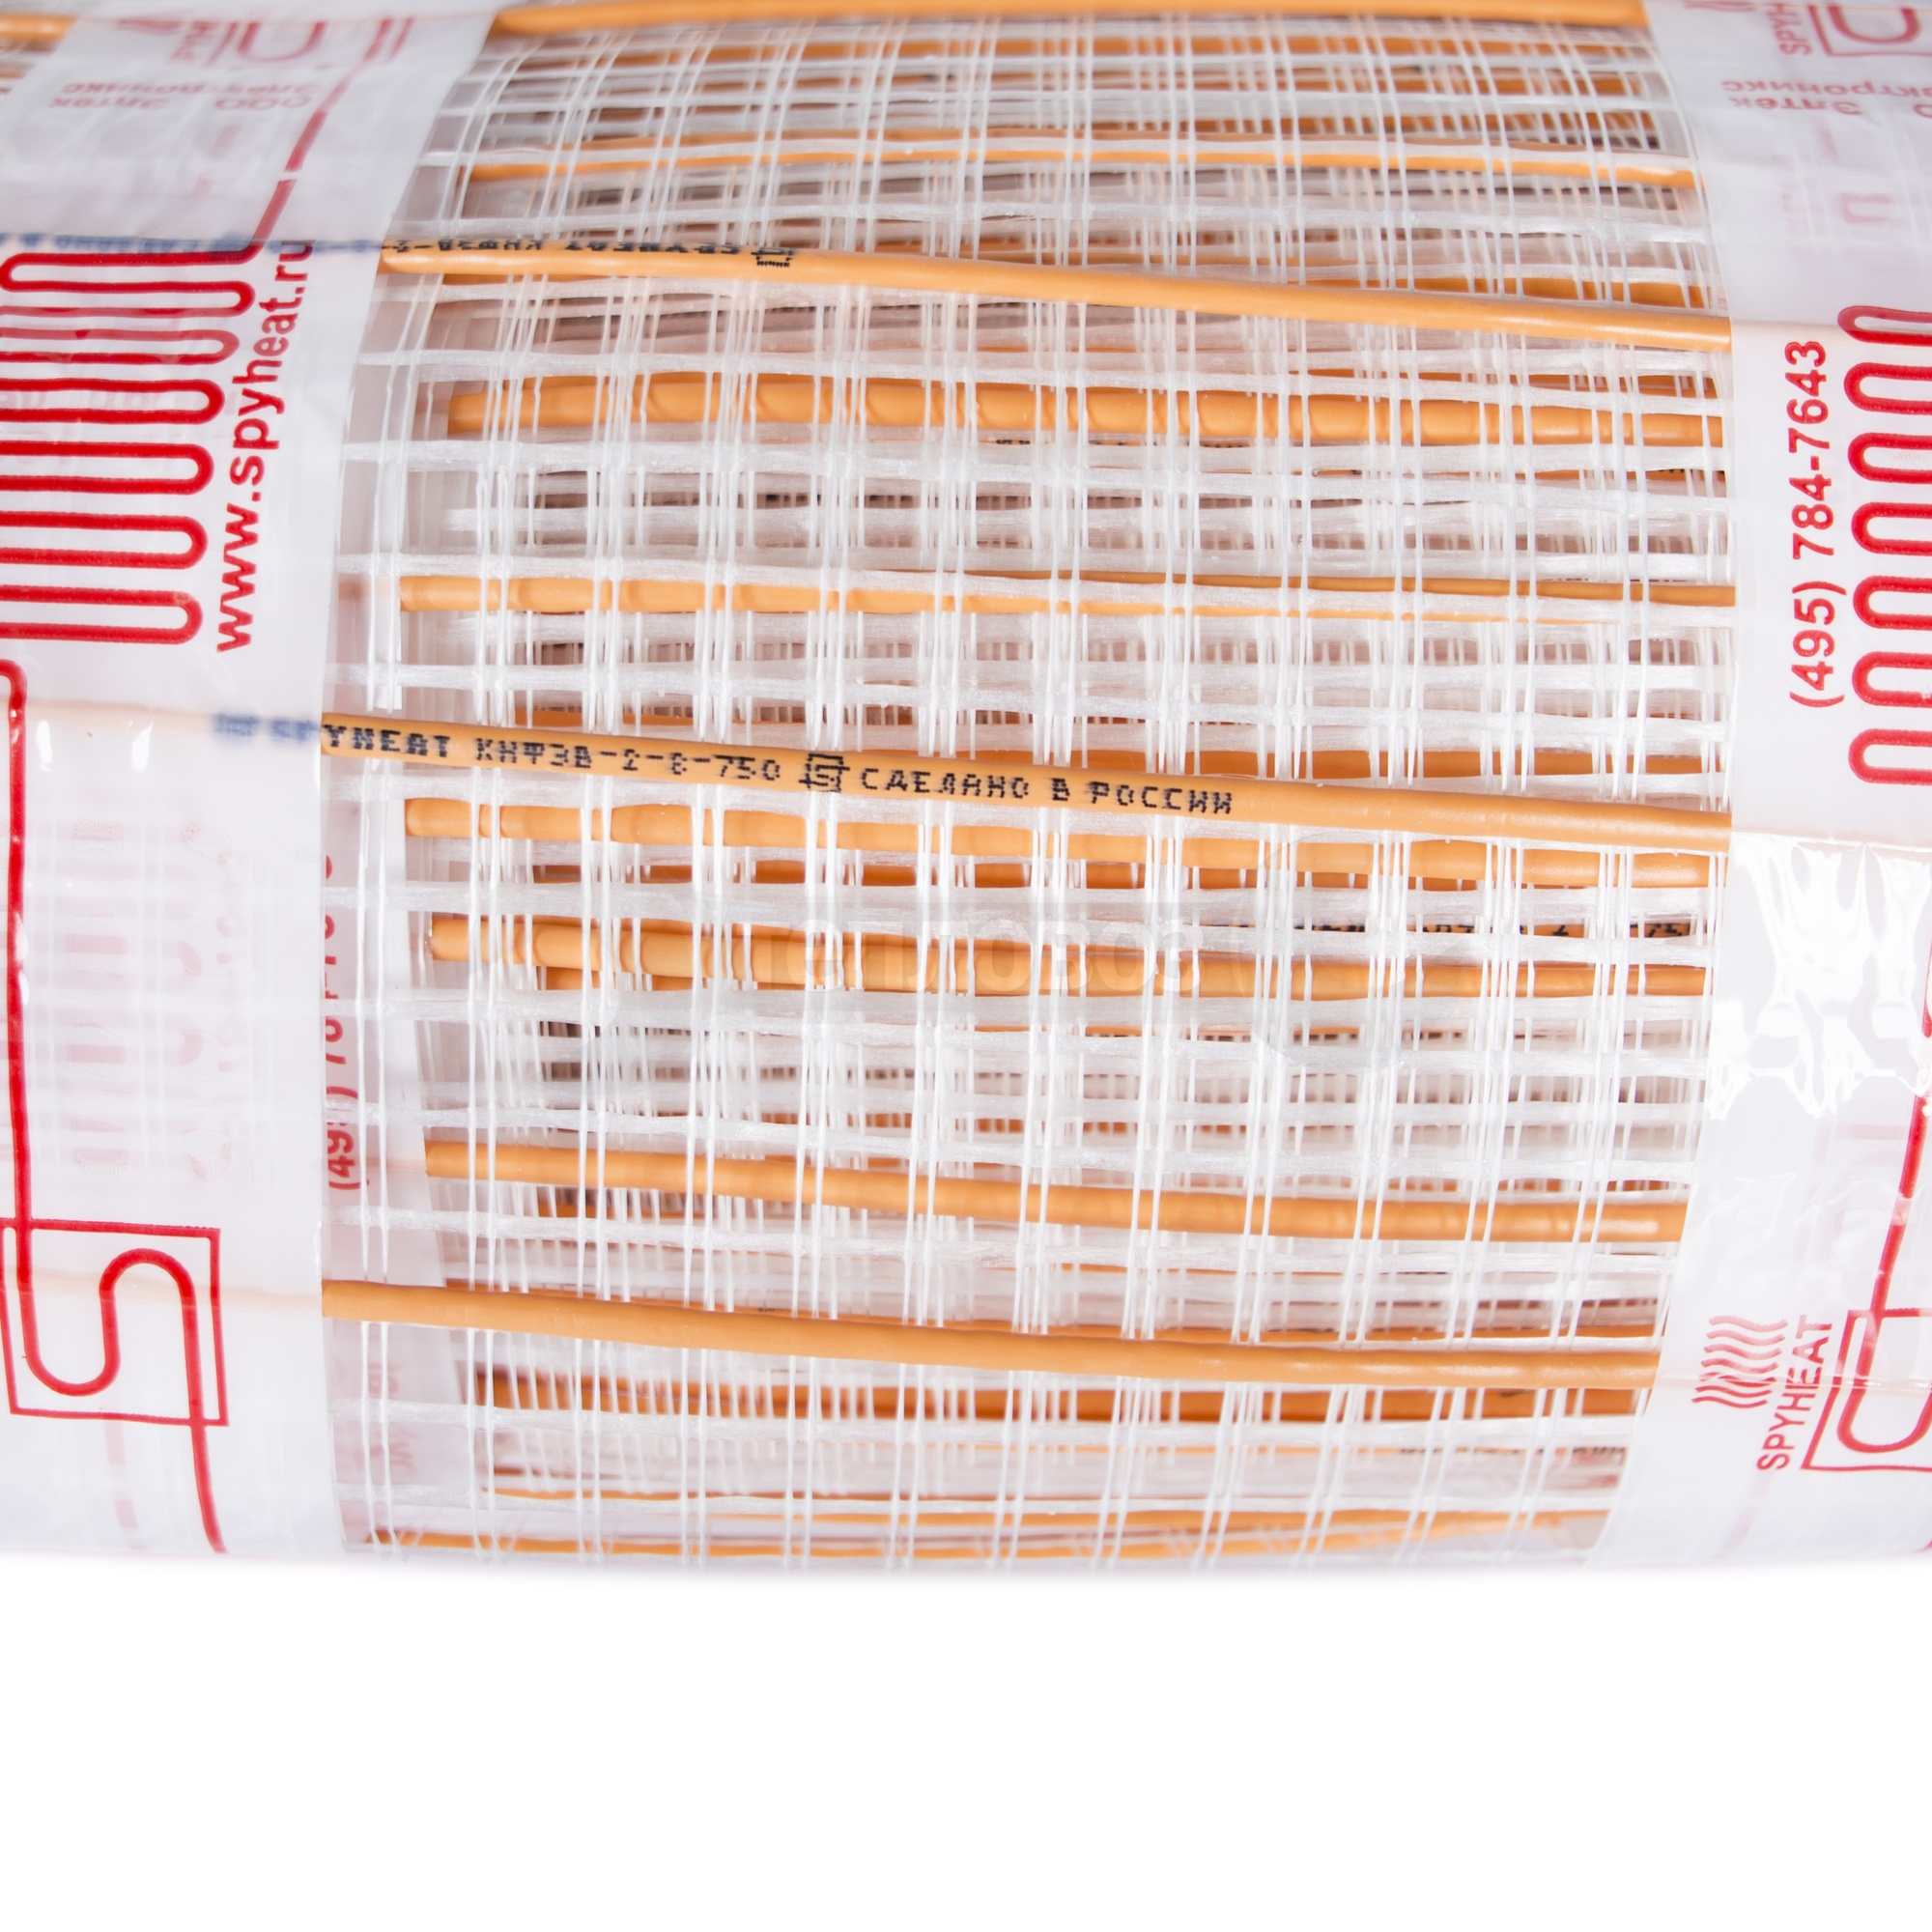 Spyheat Shмd - 8-750 Вт